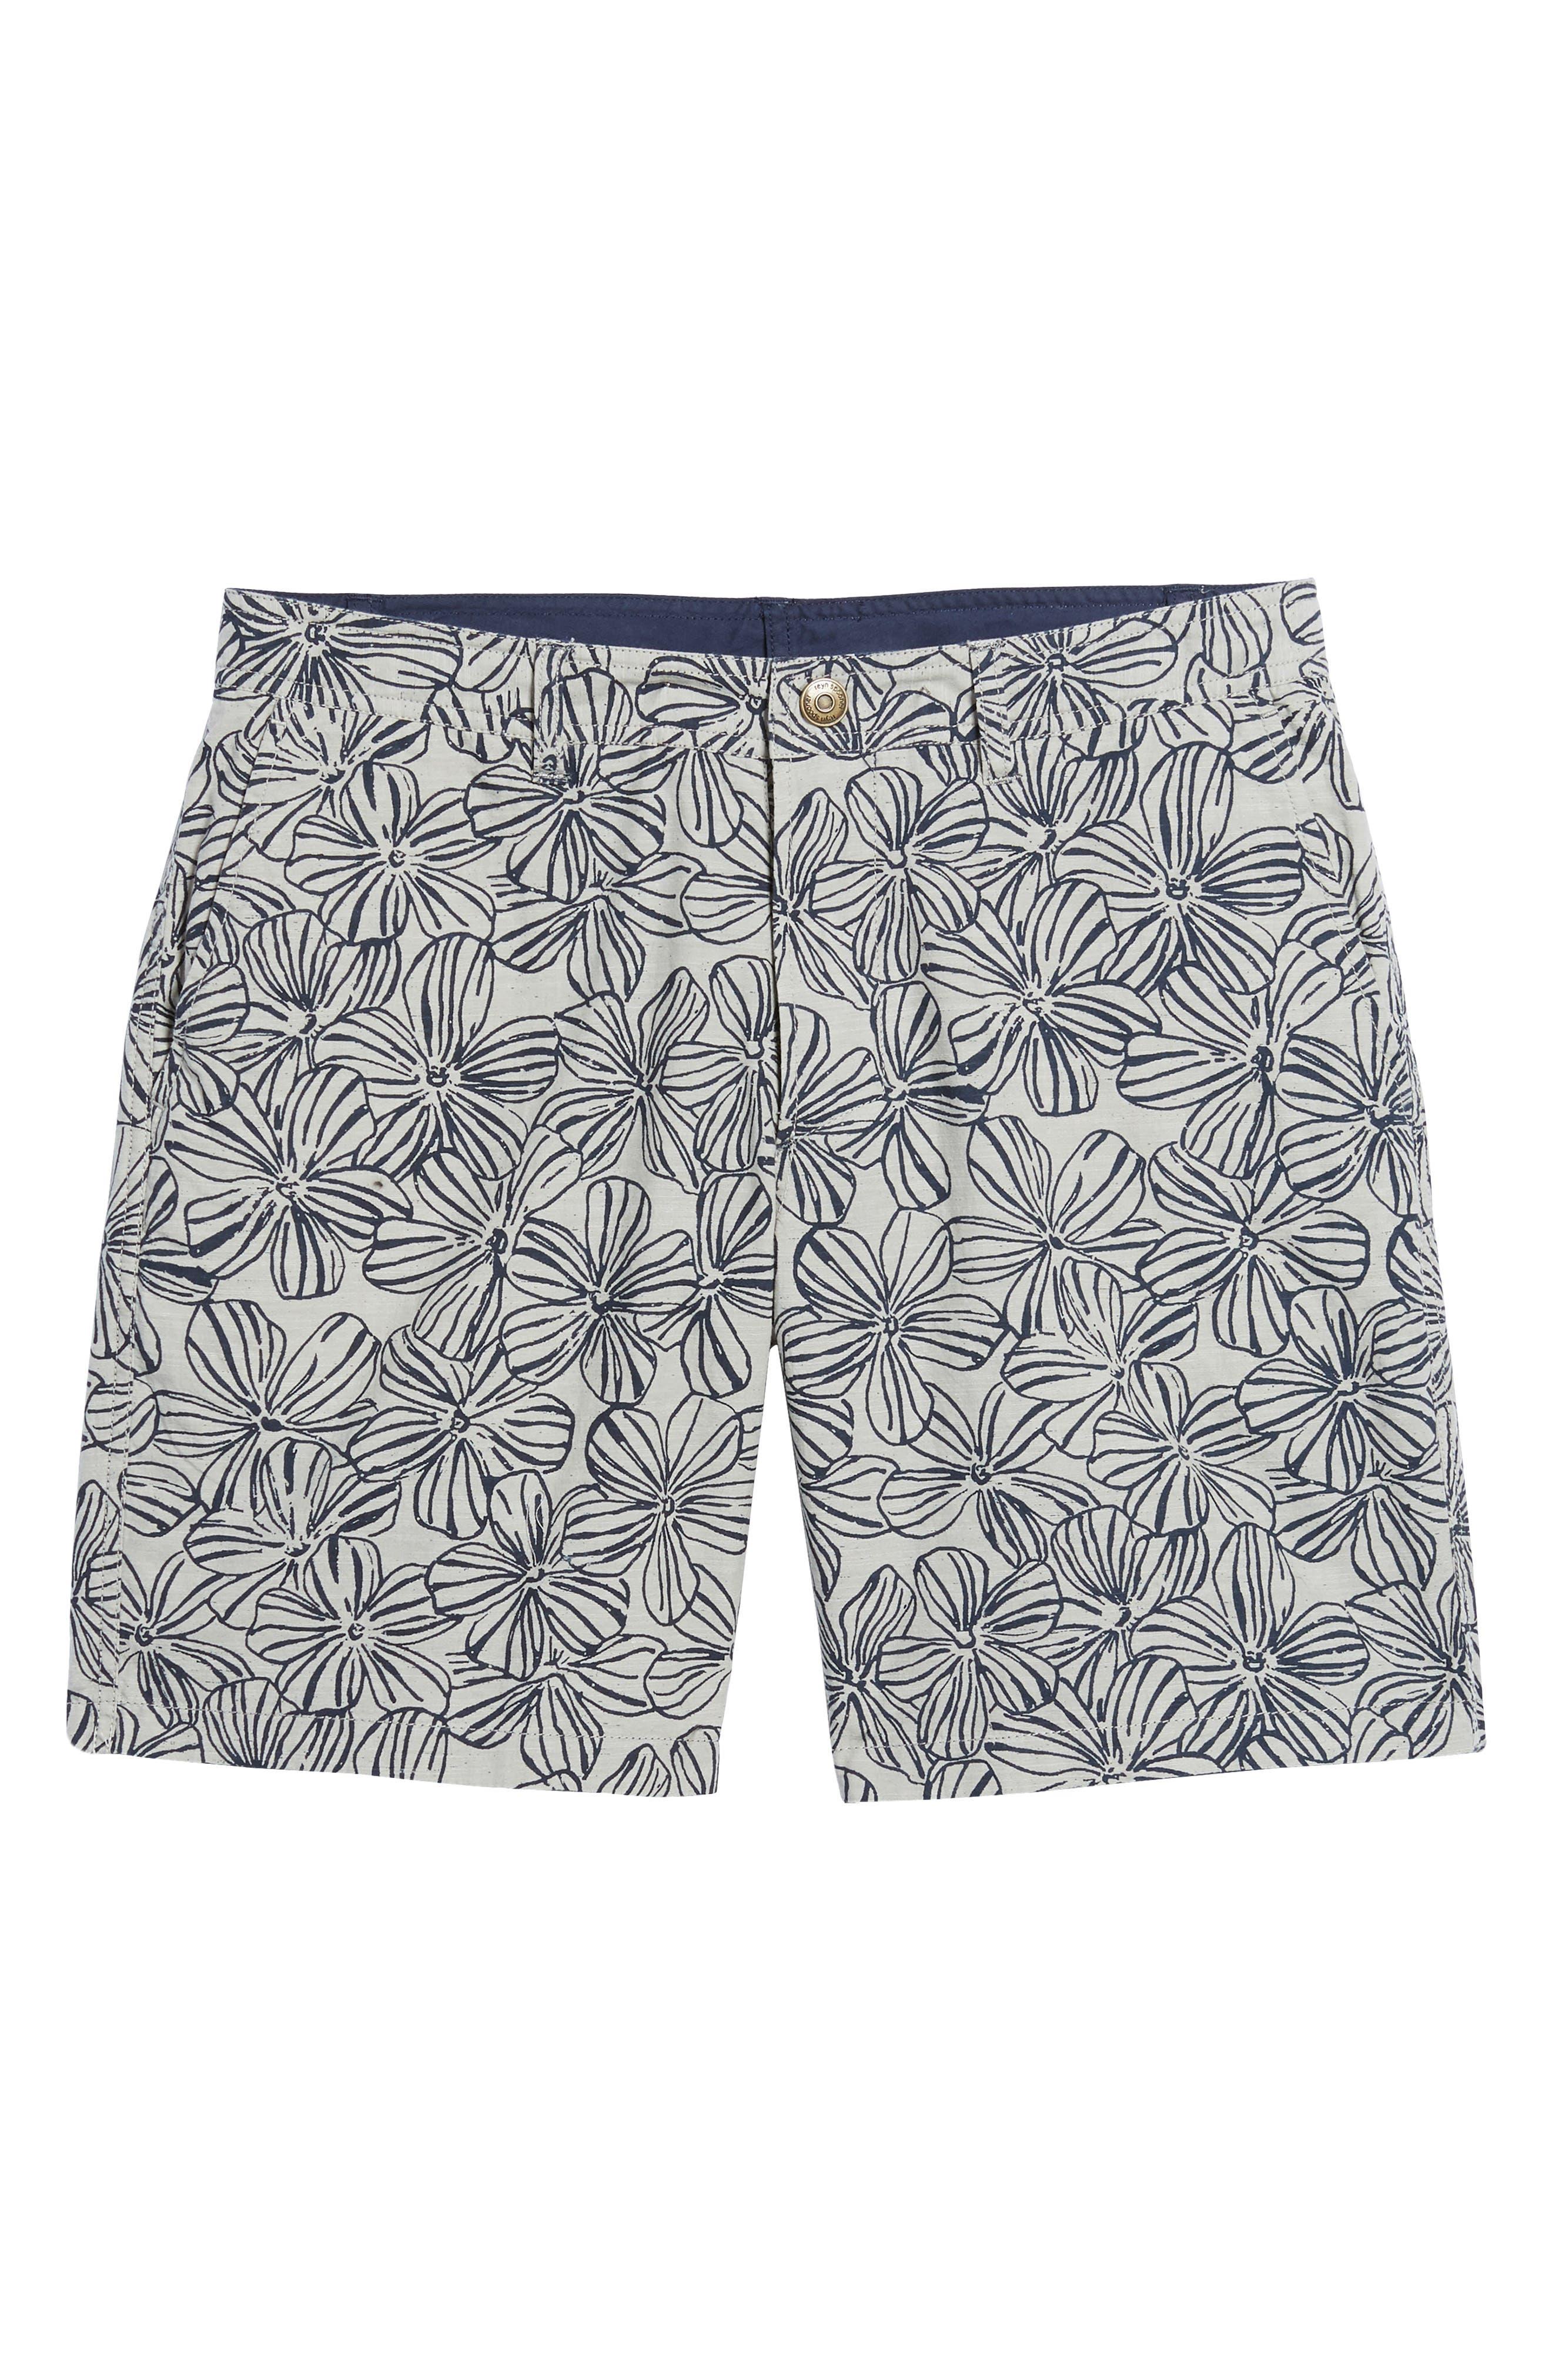 Mala Melia Reversible Chino Shorts,                             Alternate thumbnail 7, color,                             030